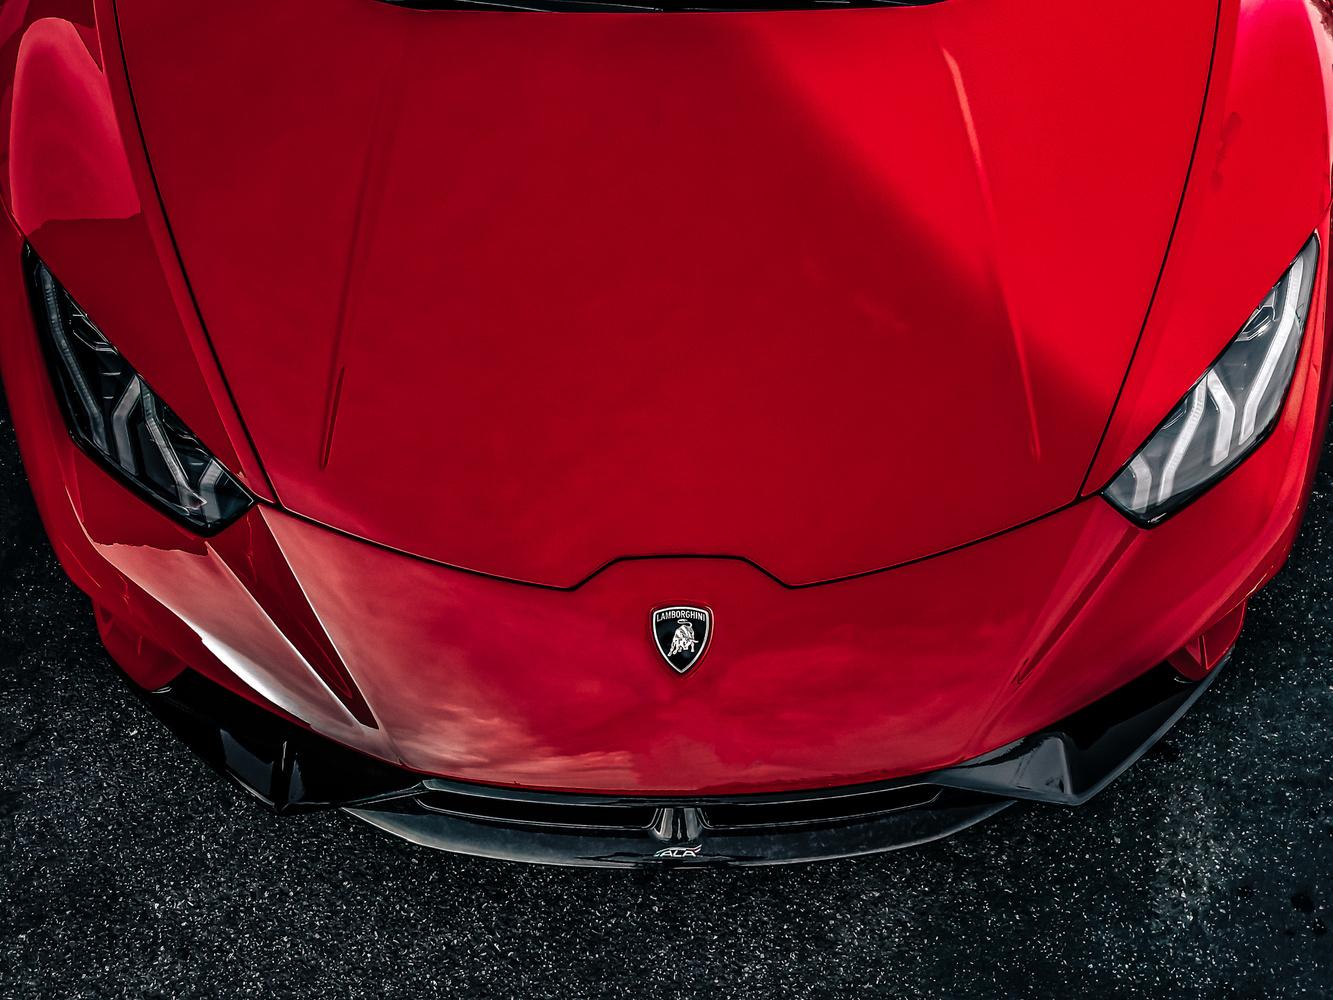 Lamborghini Huracan Performante by Travis Pinney